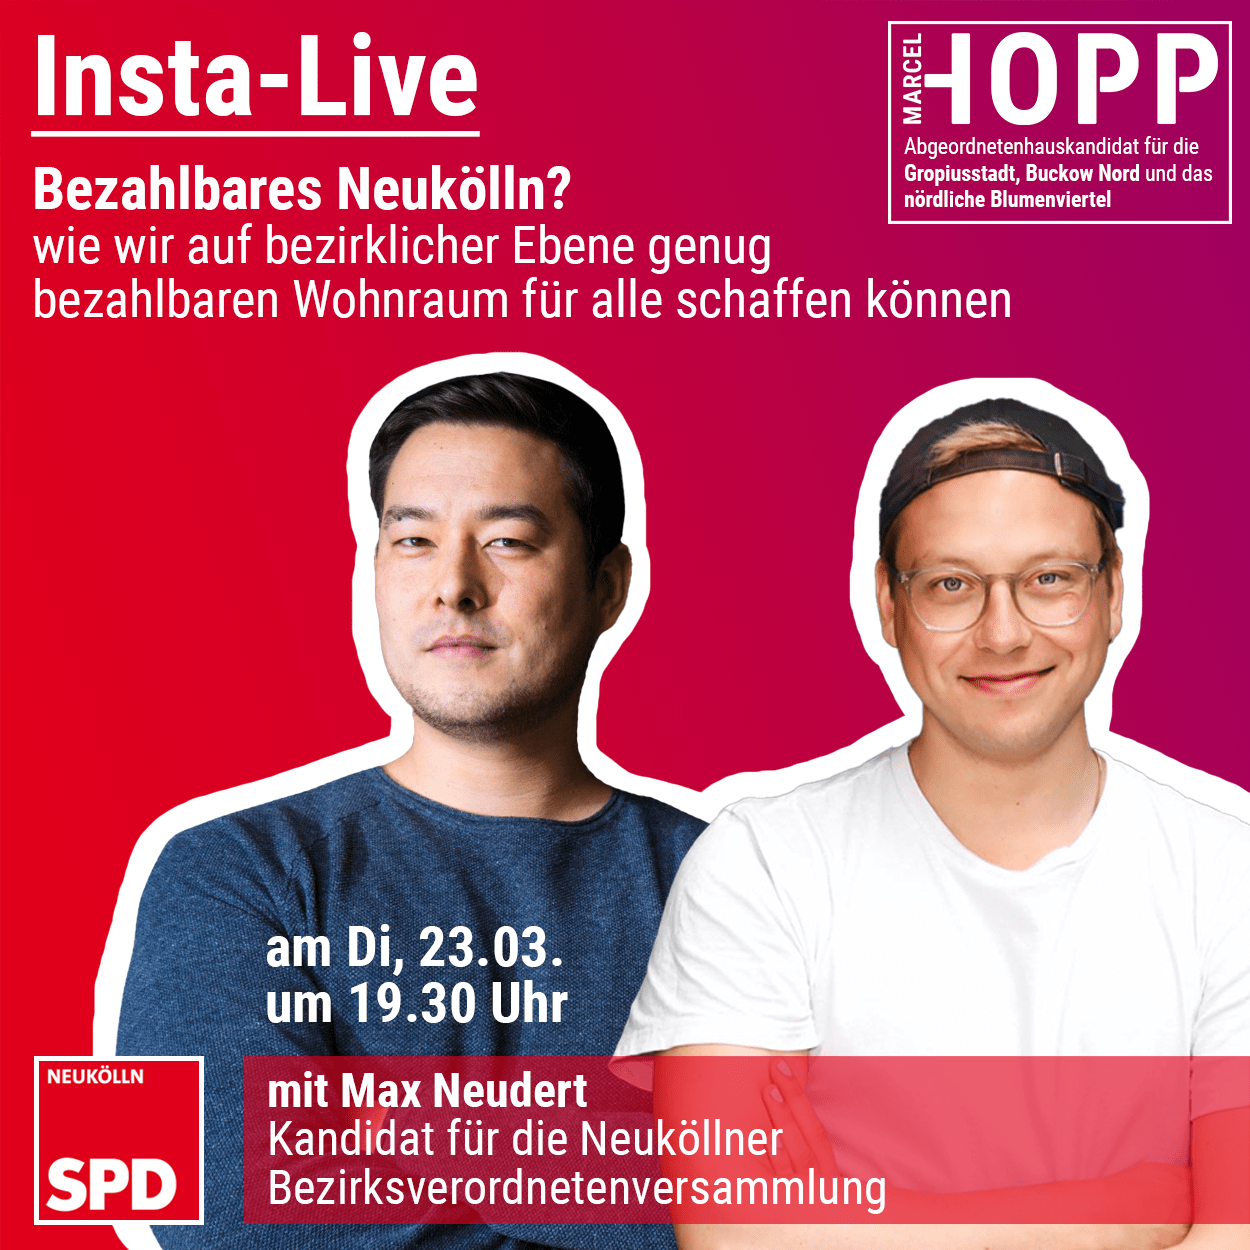 Insta-Live von Marcel Hopp mit Maximilian Neudert 1